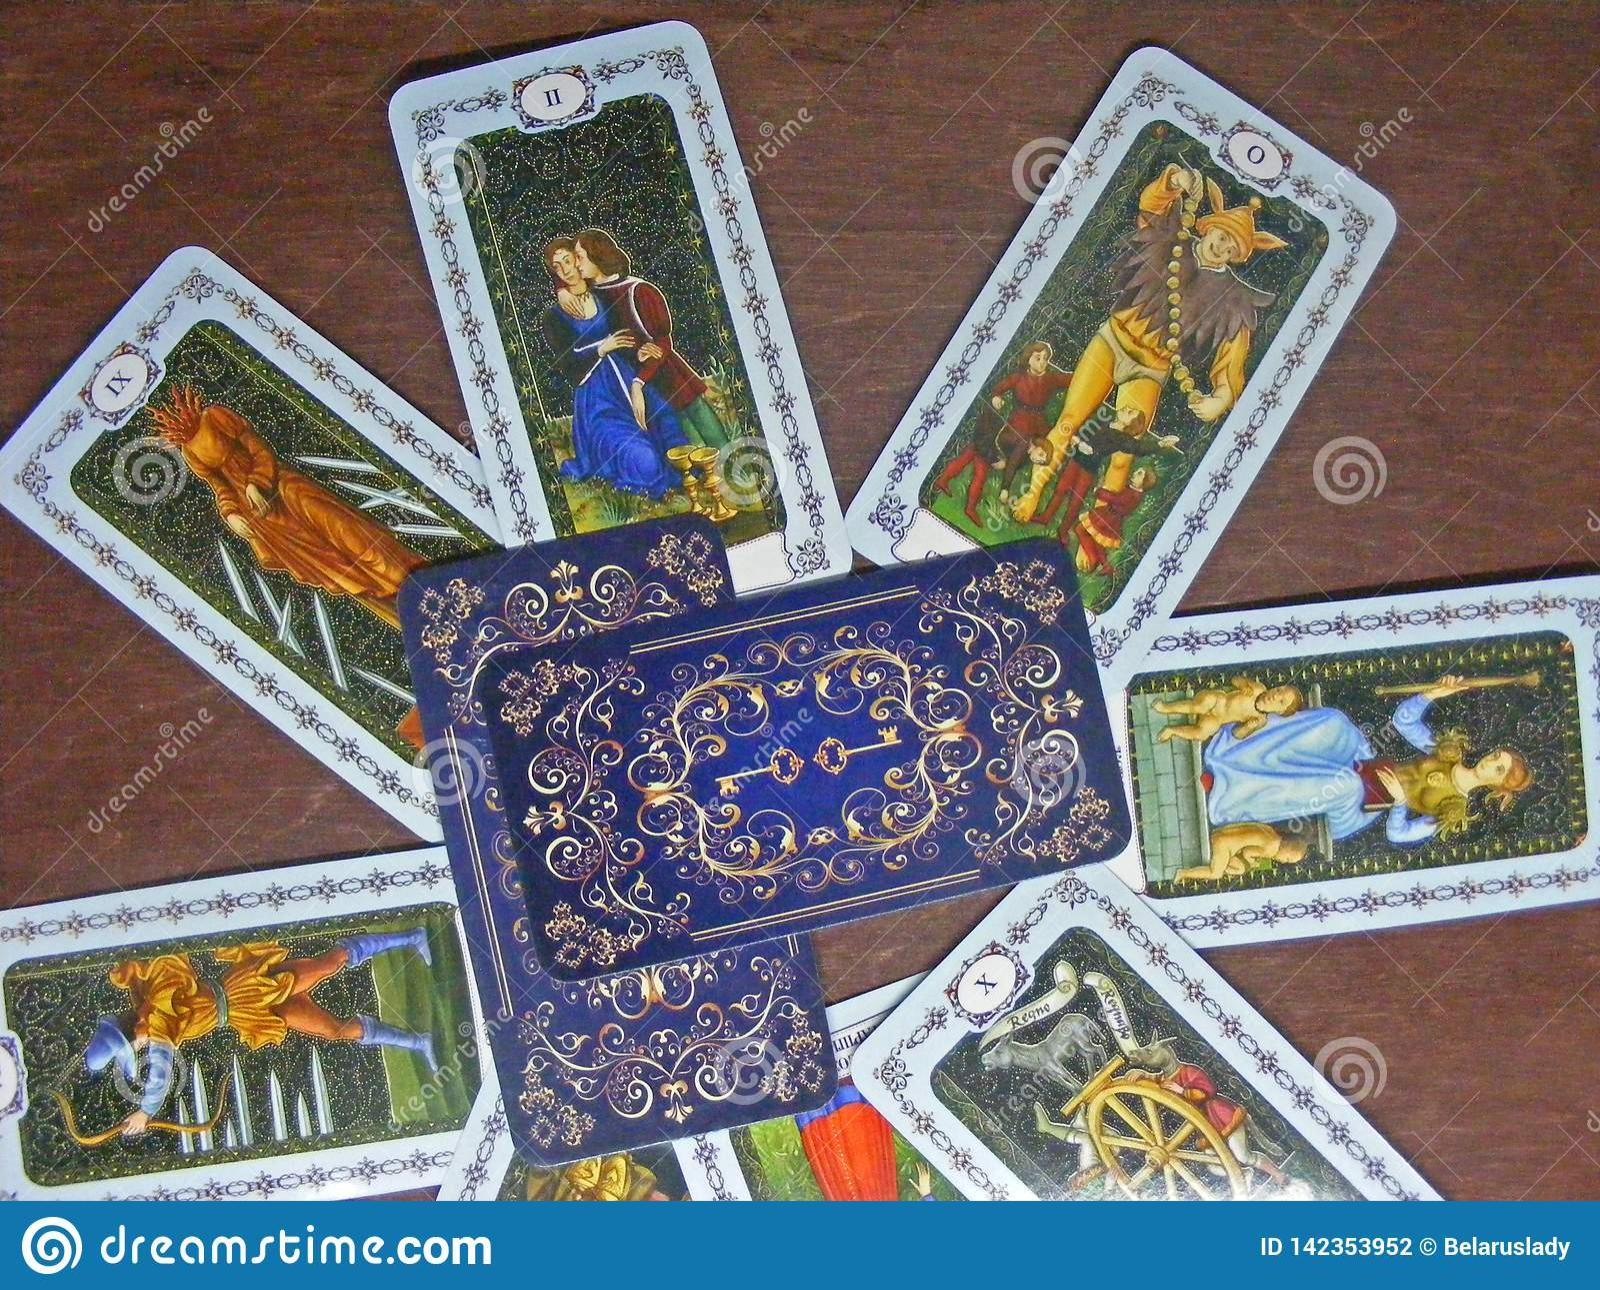 Tarot card reading concept. Medieval tarot on wooden table